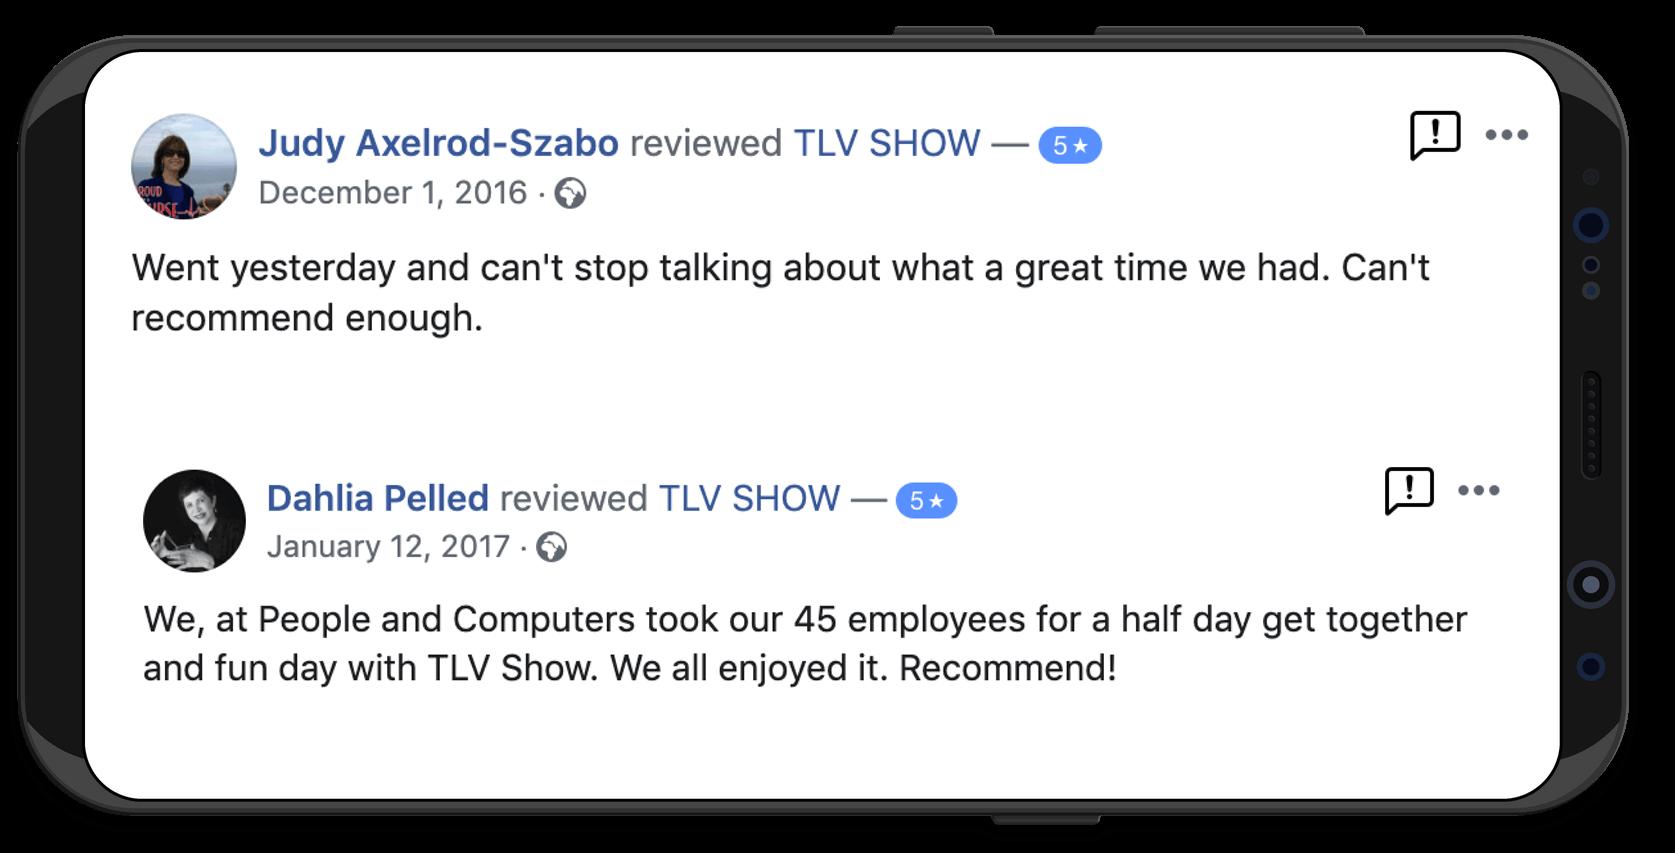 TLV SHOW Review